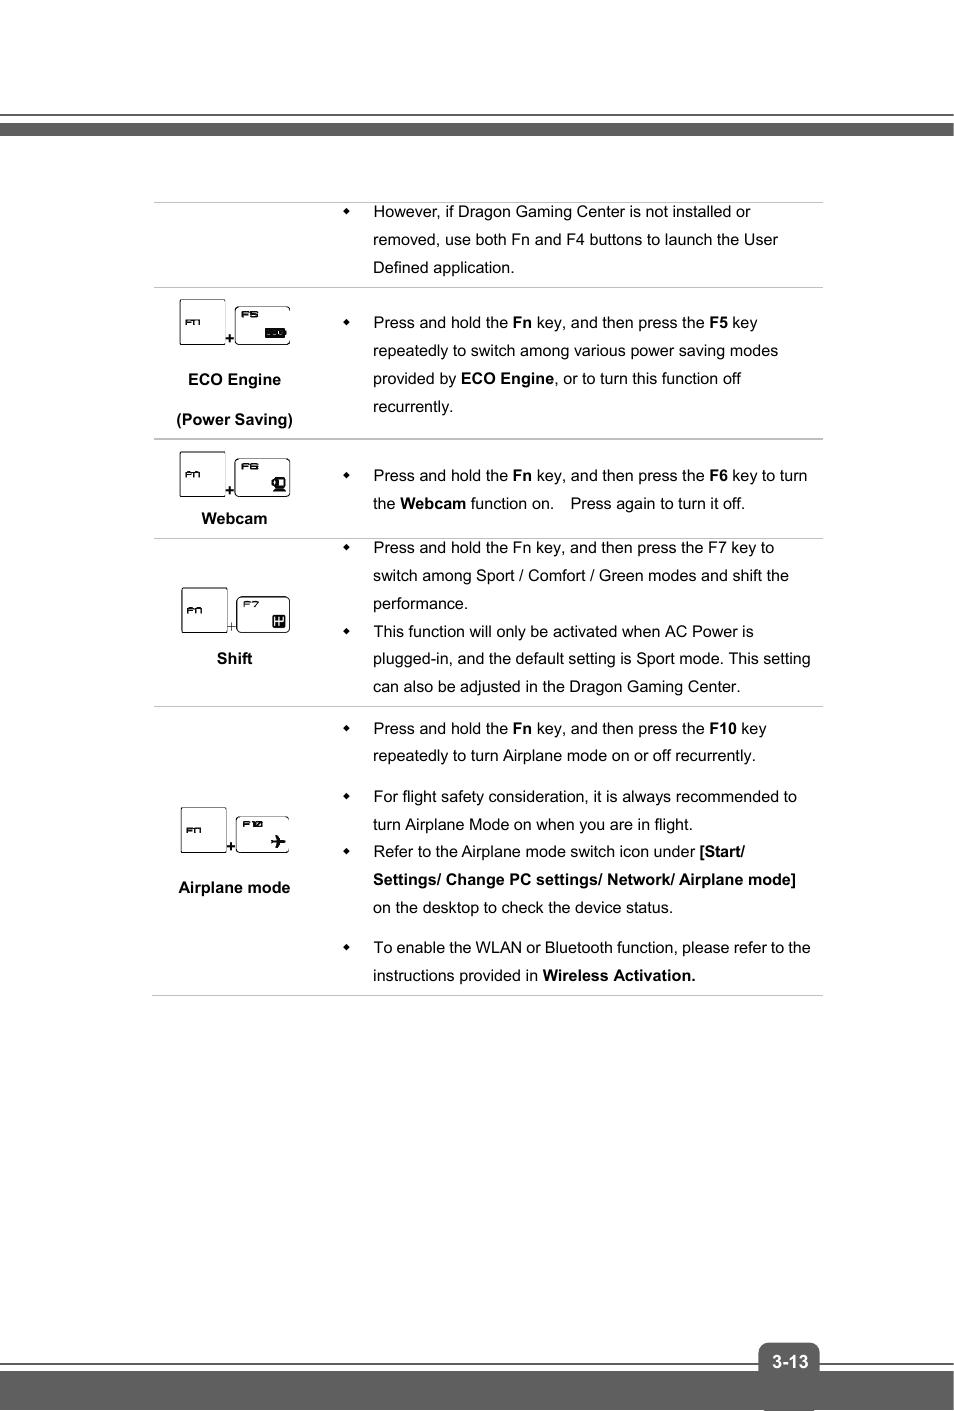 Msi dragon center shift modes   MSI Dragon Center 'Turbo' Shift Mode